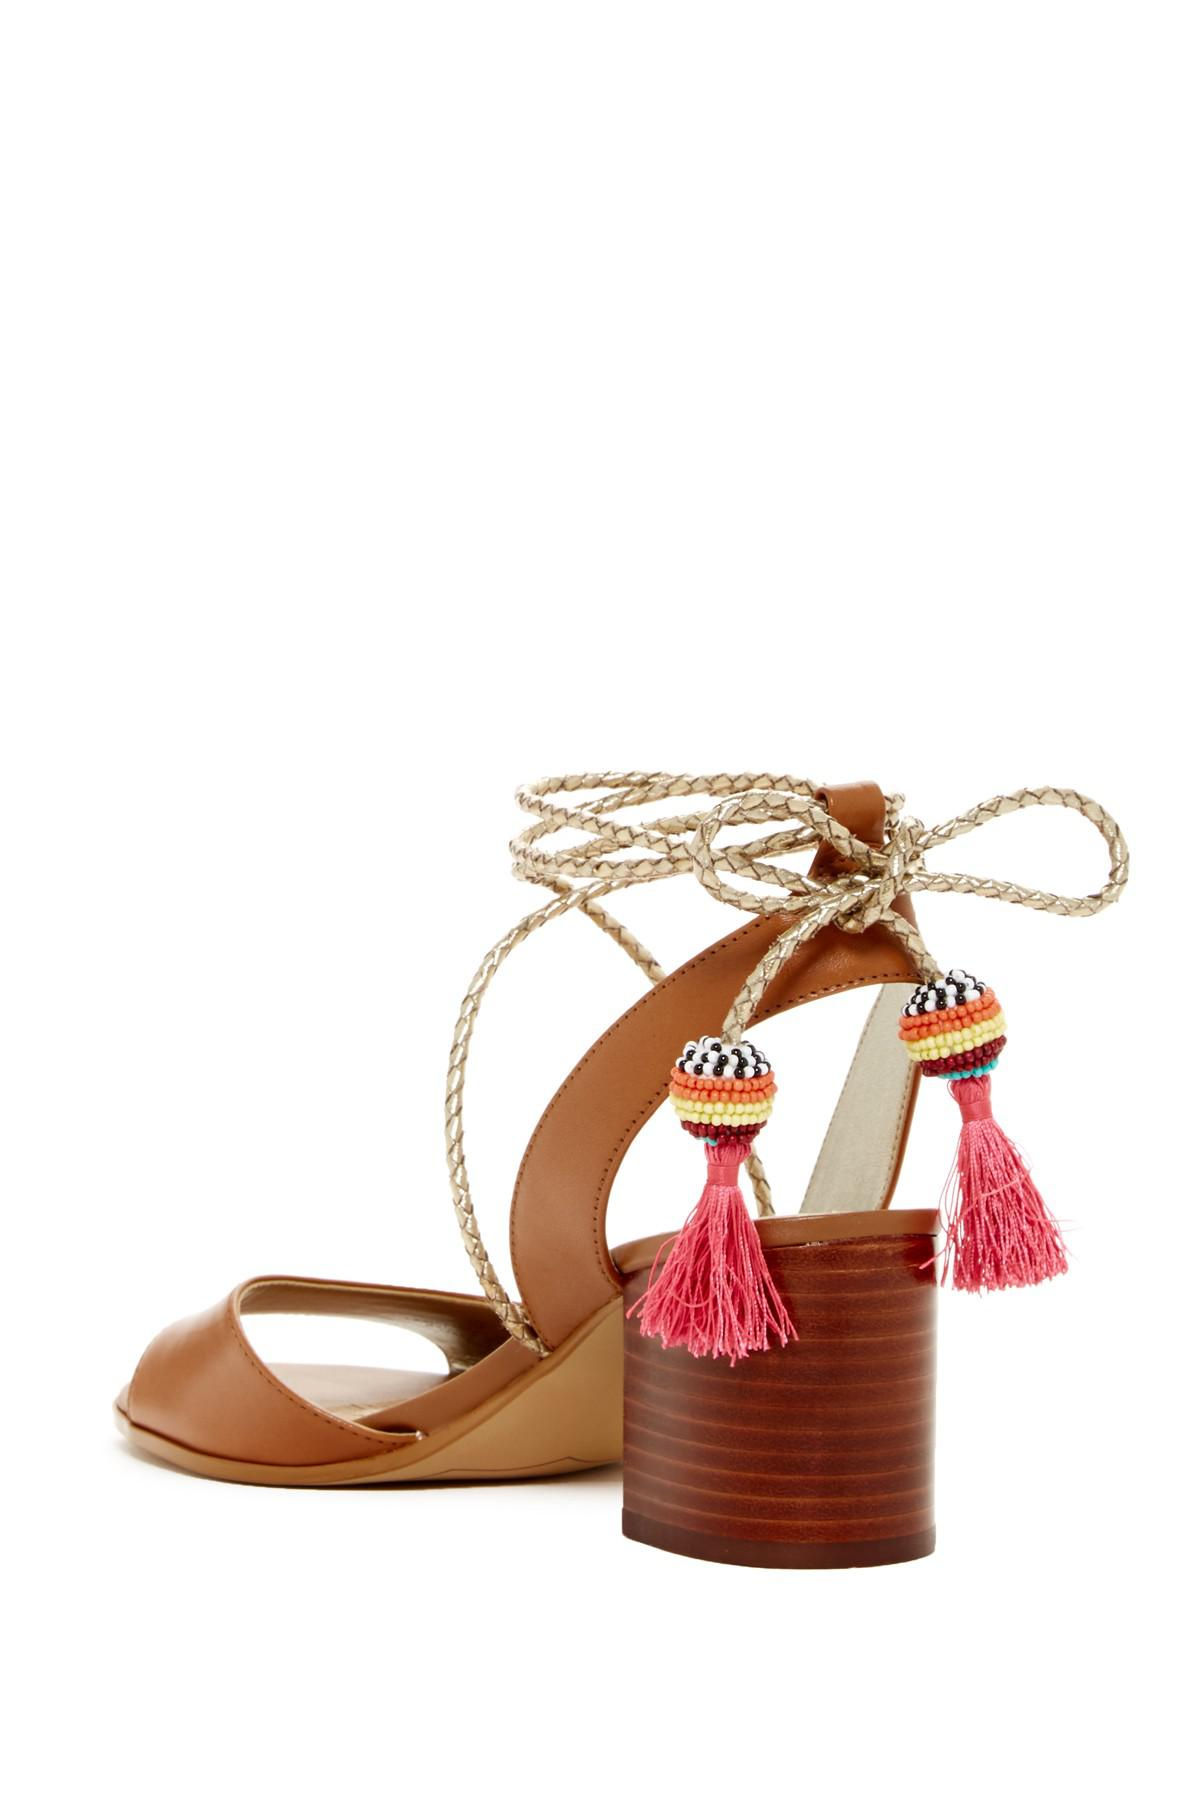 d1d321053878 Lyst - Sam Edelman Shani Block Heel Sandal in Brown